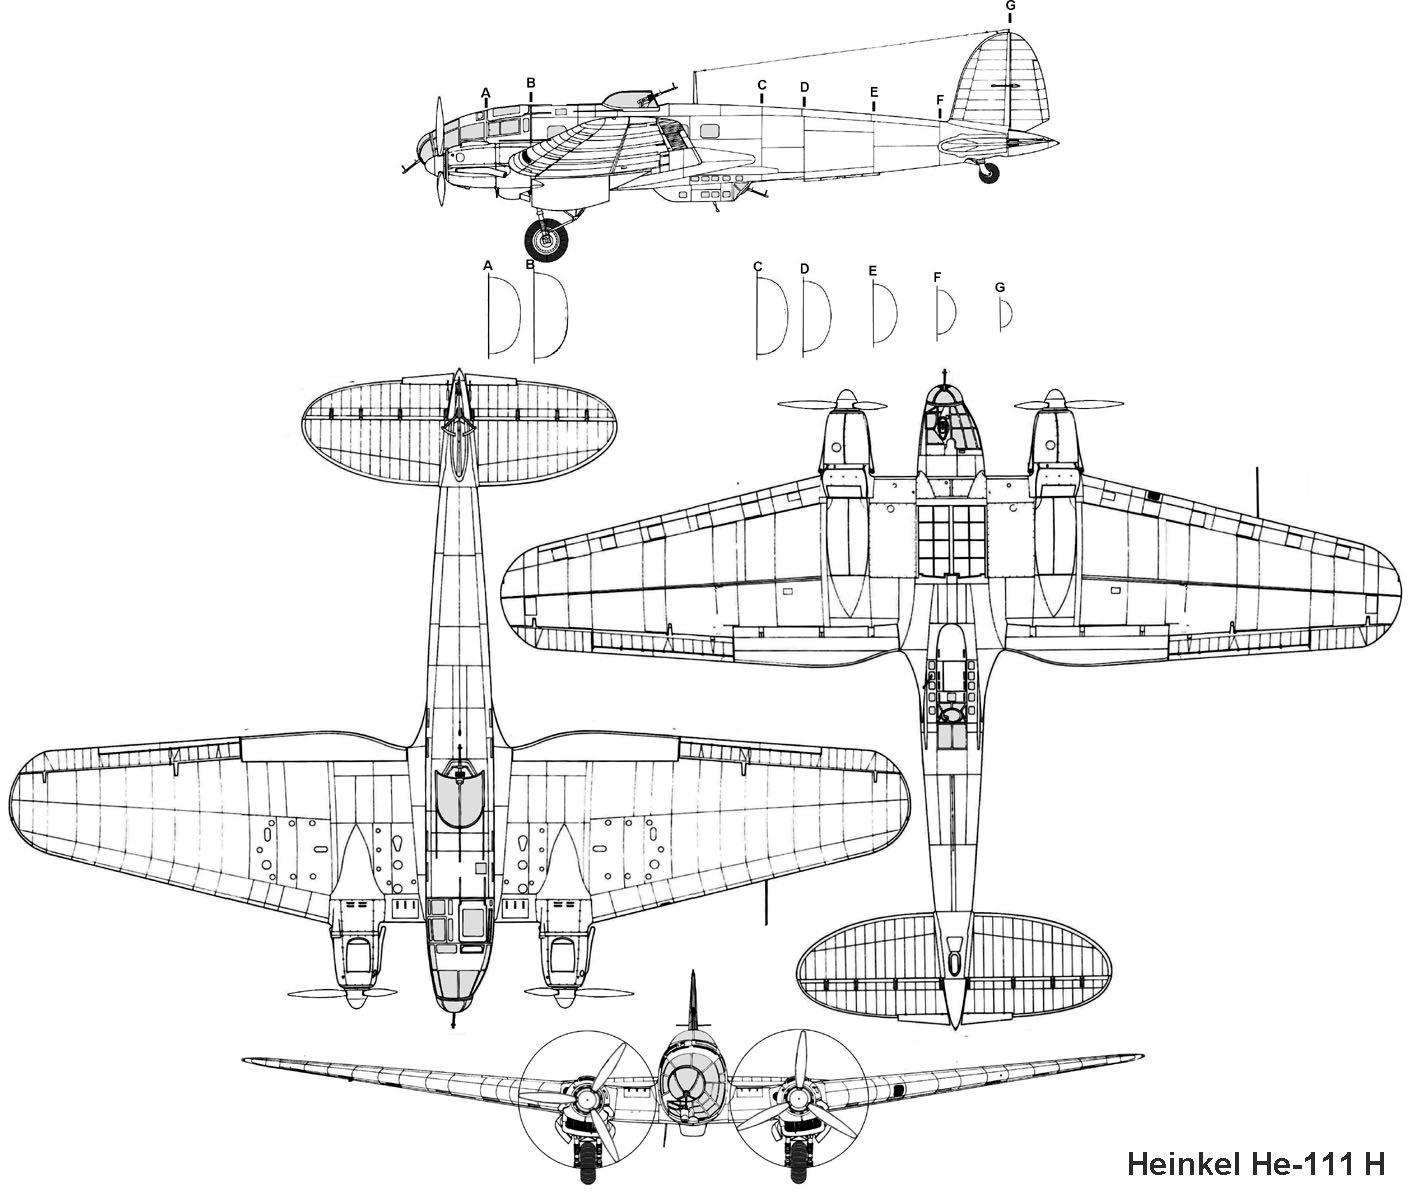 Flightgear Forum View Topic